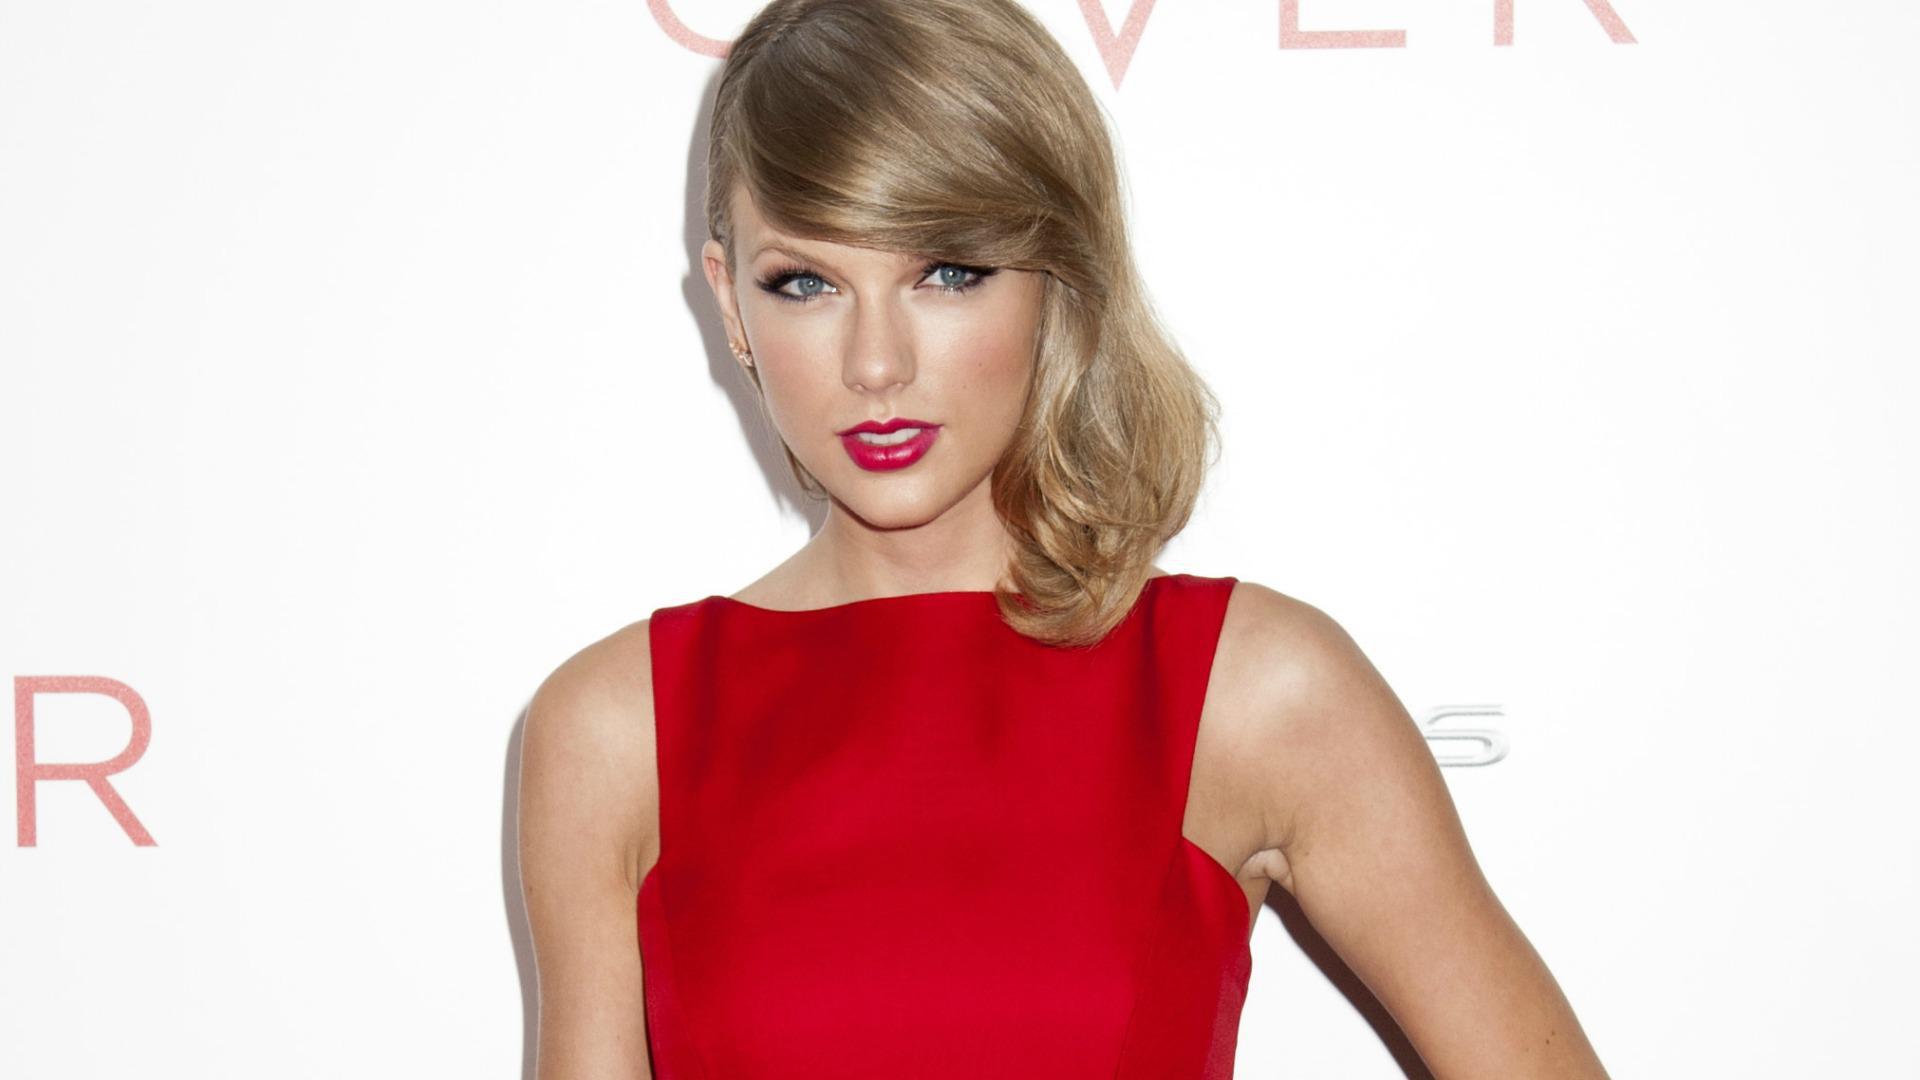 Taylor Swift, Jimmy Fallon get nerdy for <em>Ew!</em> skit (VIDEO)